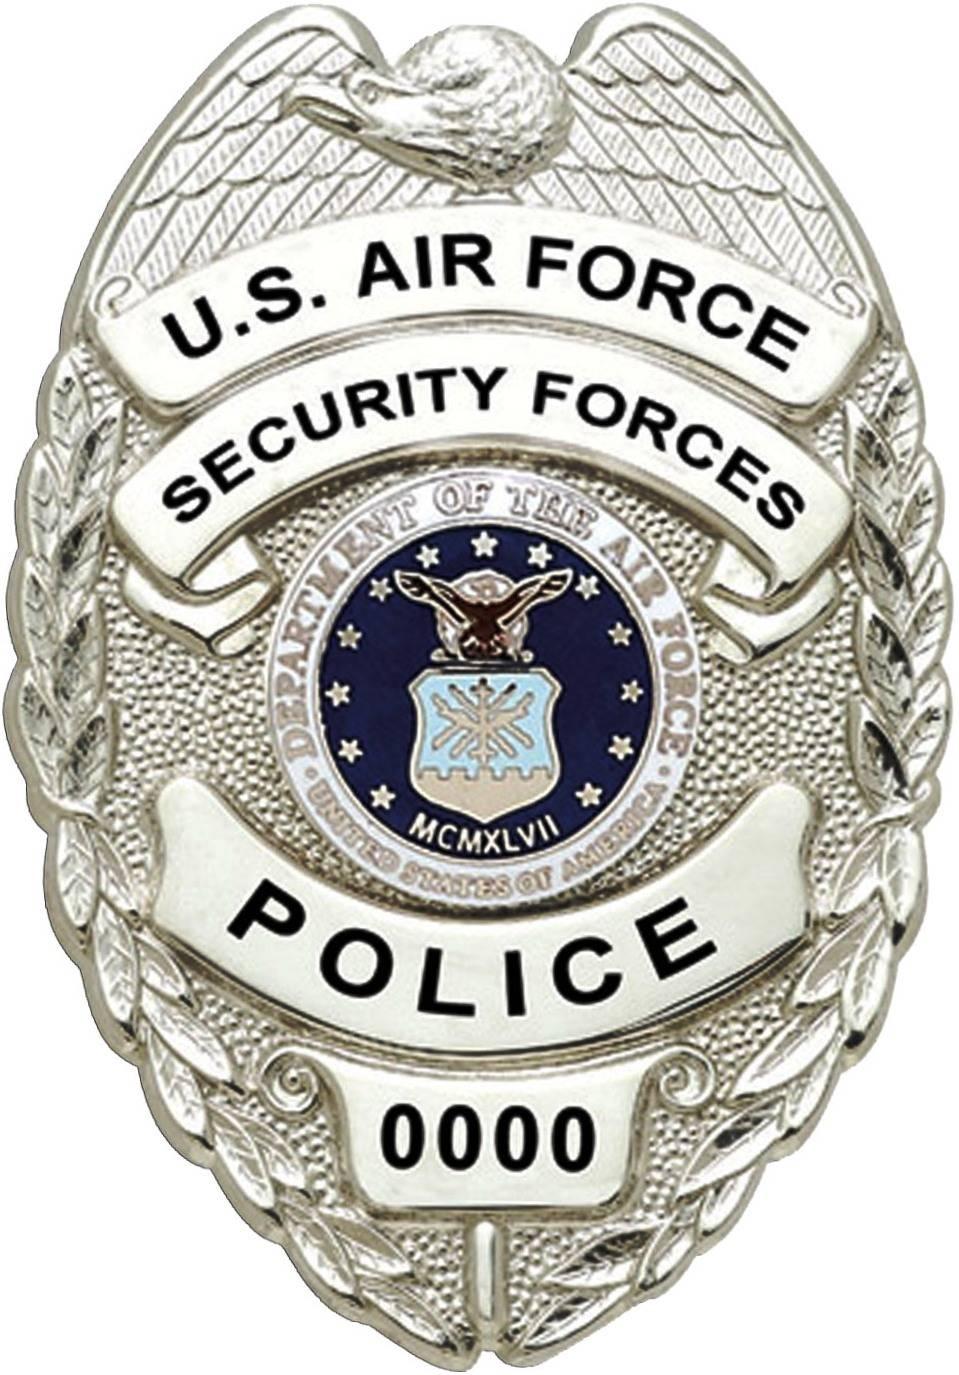 US Air Force Civilian Police badge